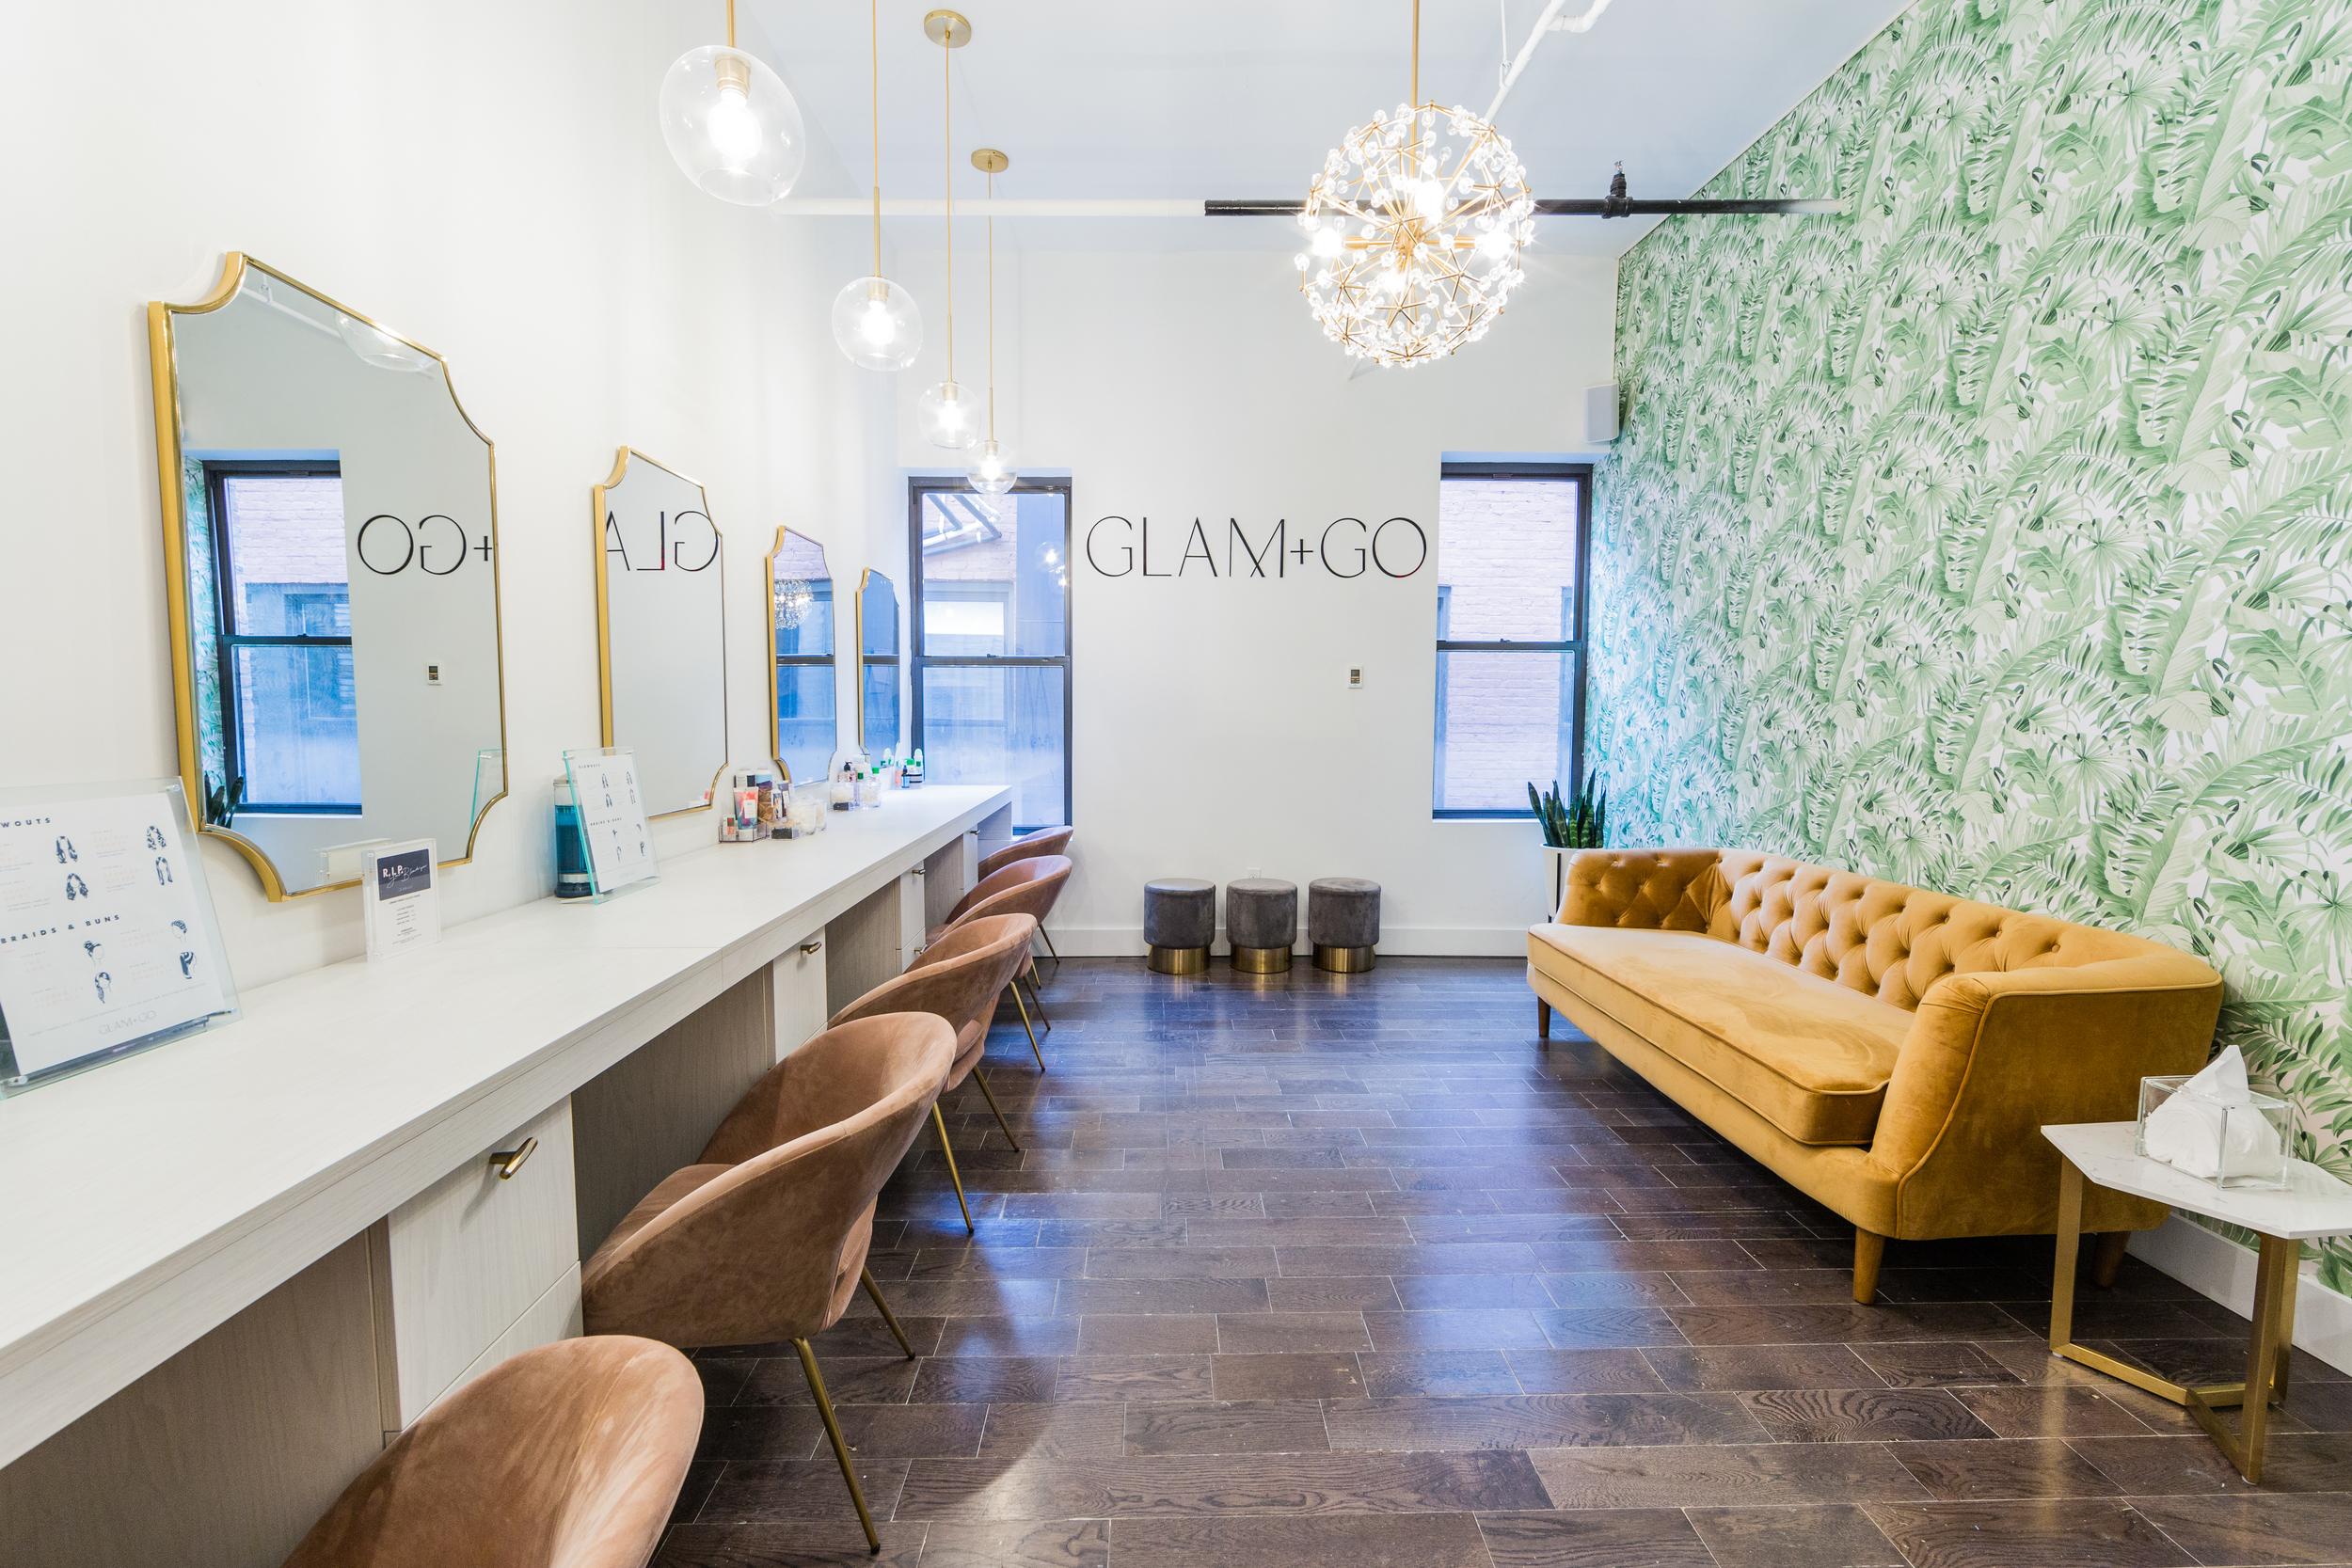 Luminary_interiors_openletr_interview_Cate_Luzio_Hair_Glam+Go .jpg